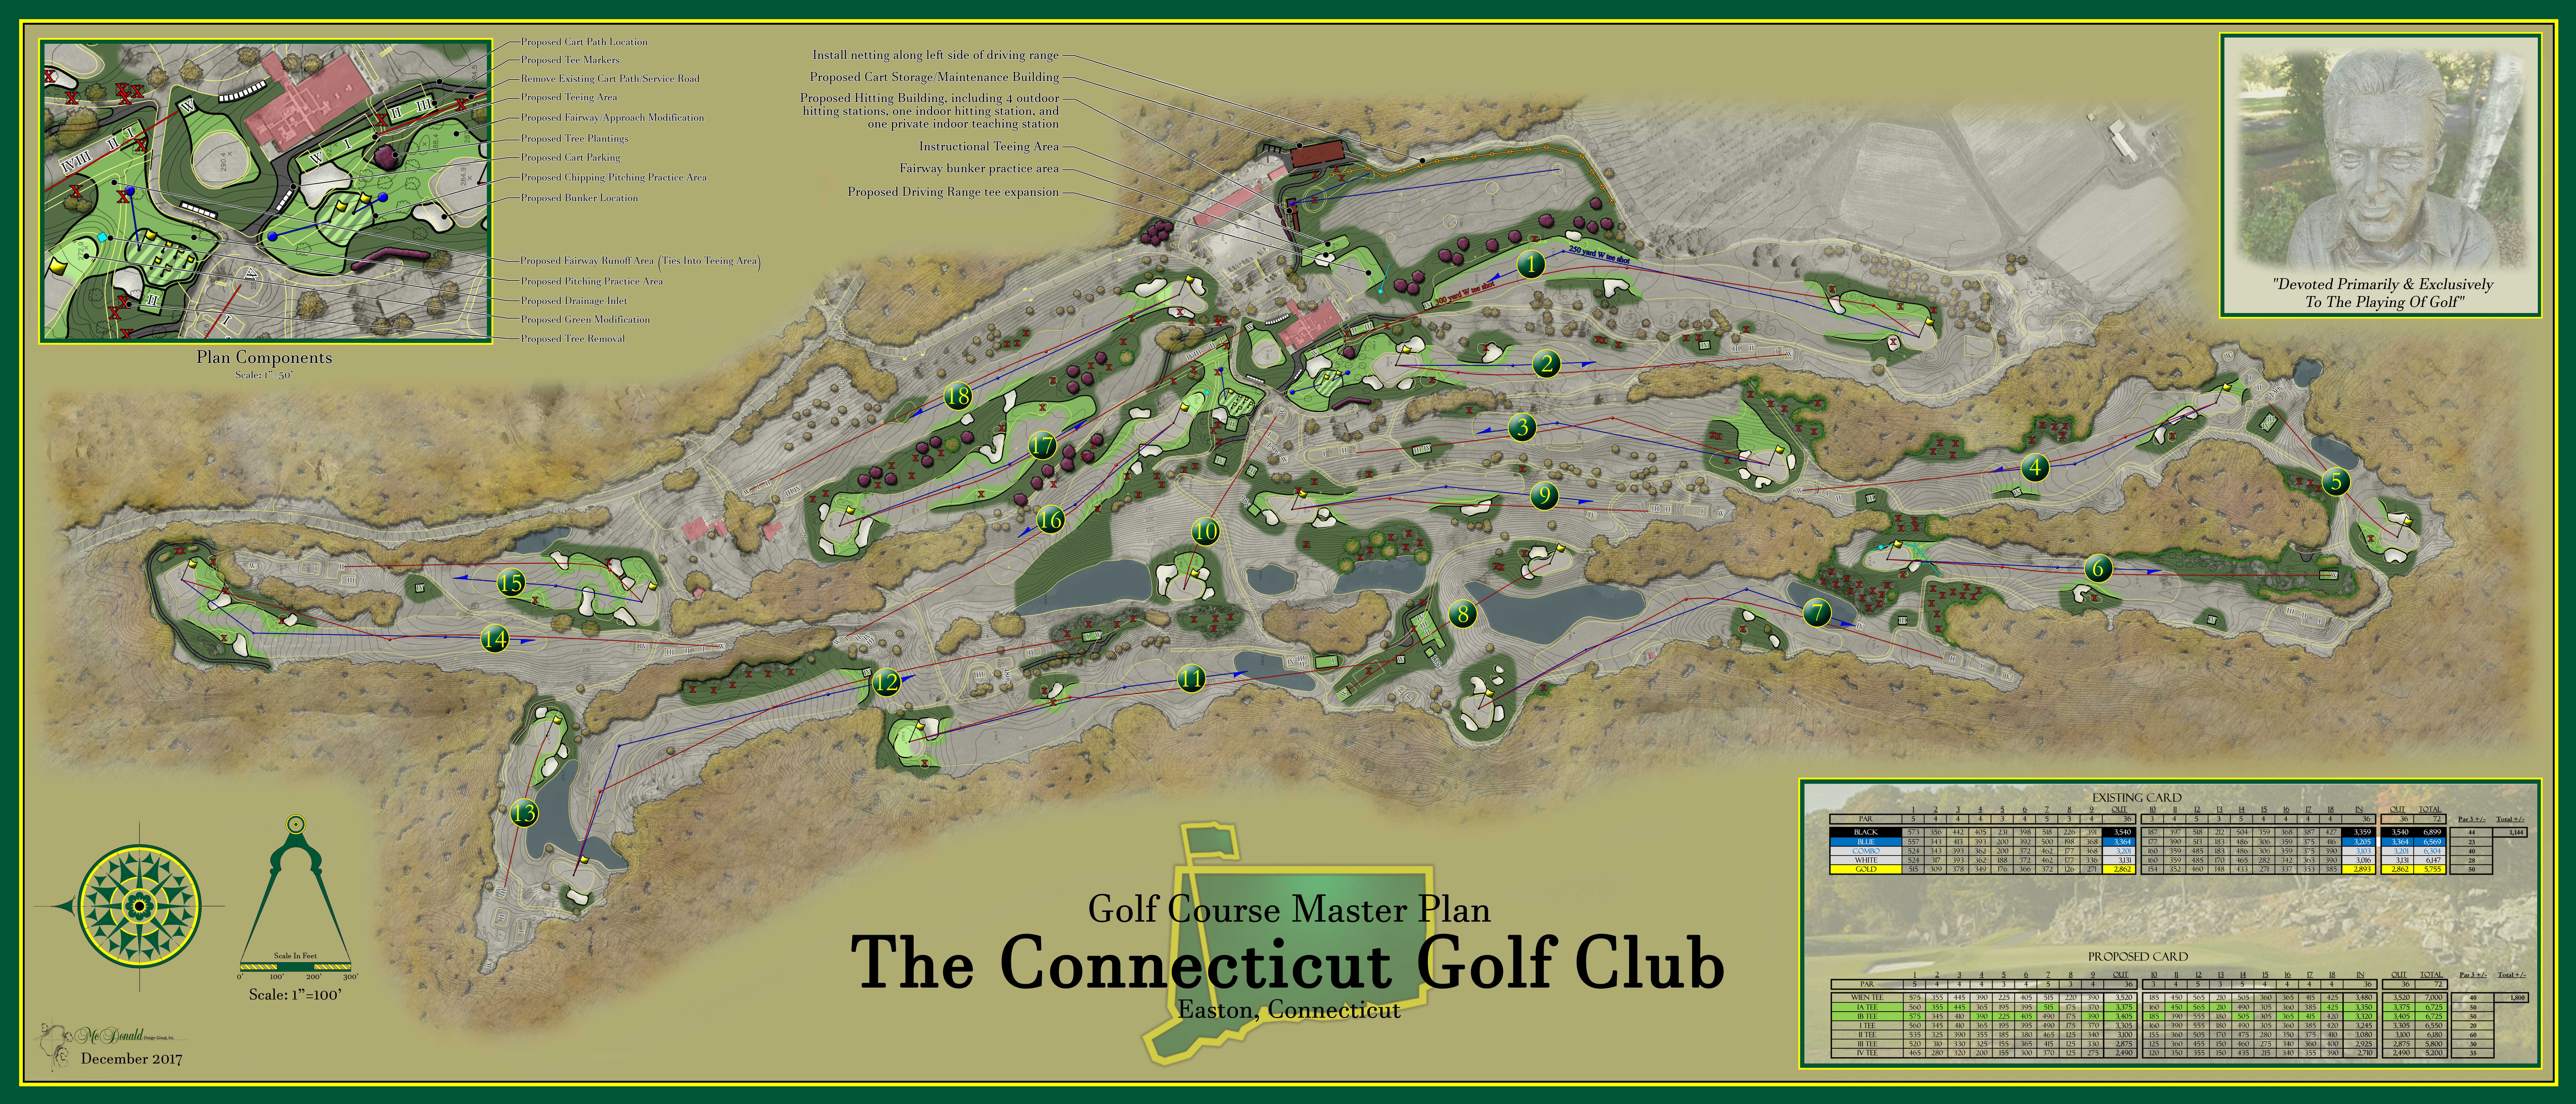 Connecticut Golf Club<br/>Master Planning